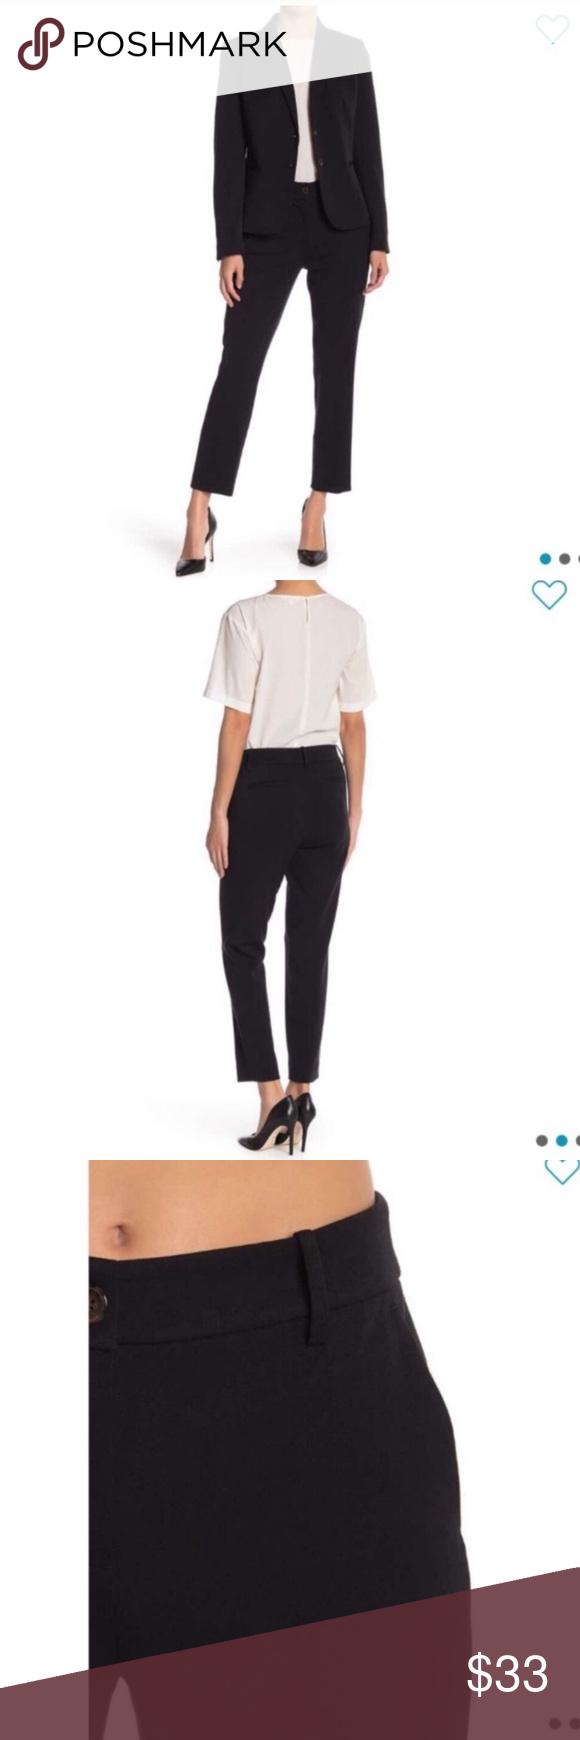 JCrew Ankle Length Dress Pants Cropped ankle pants